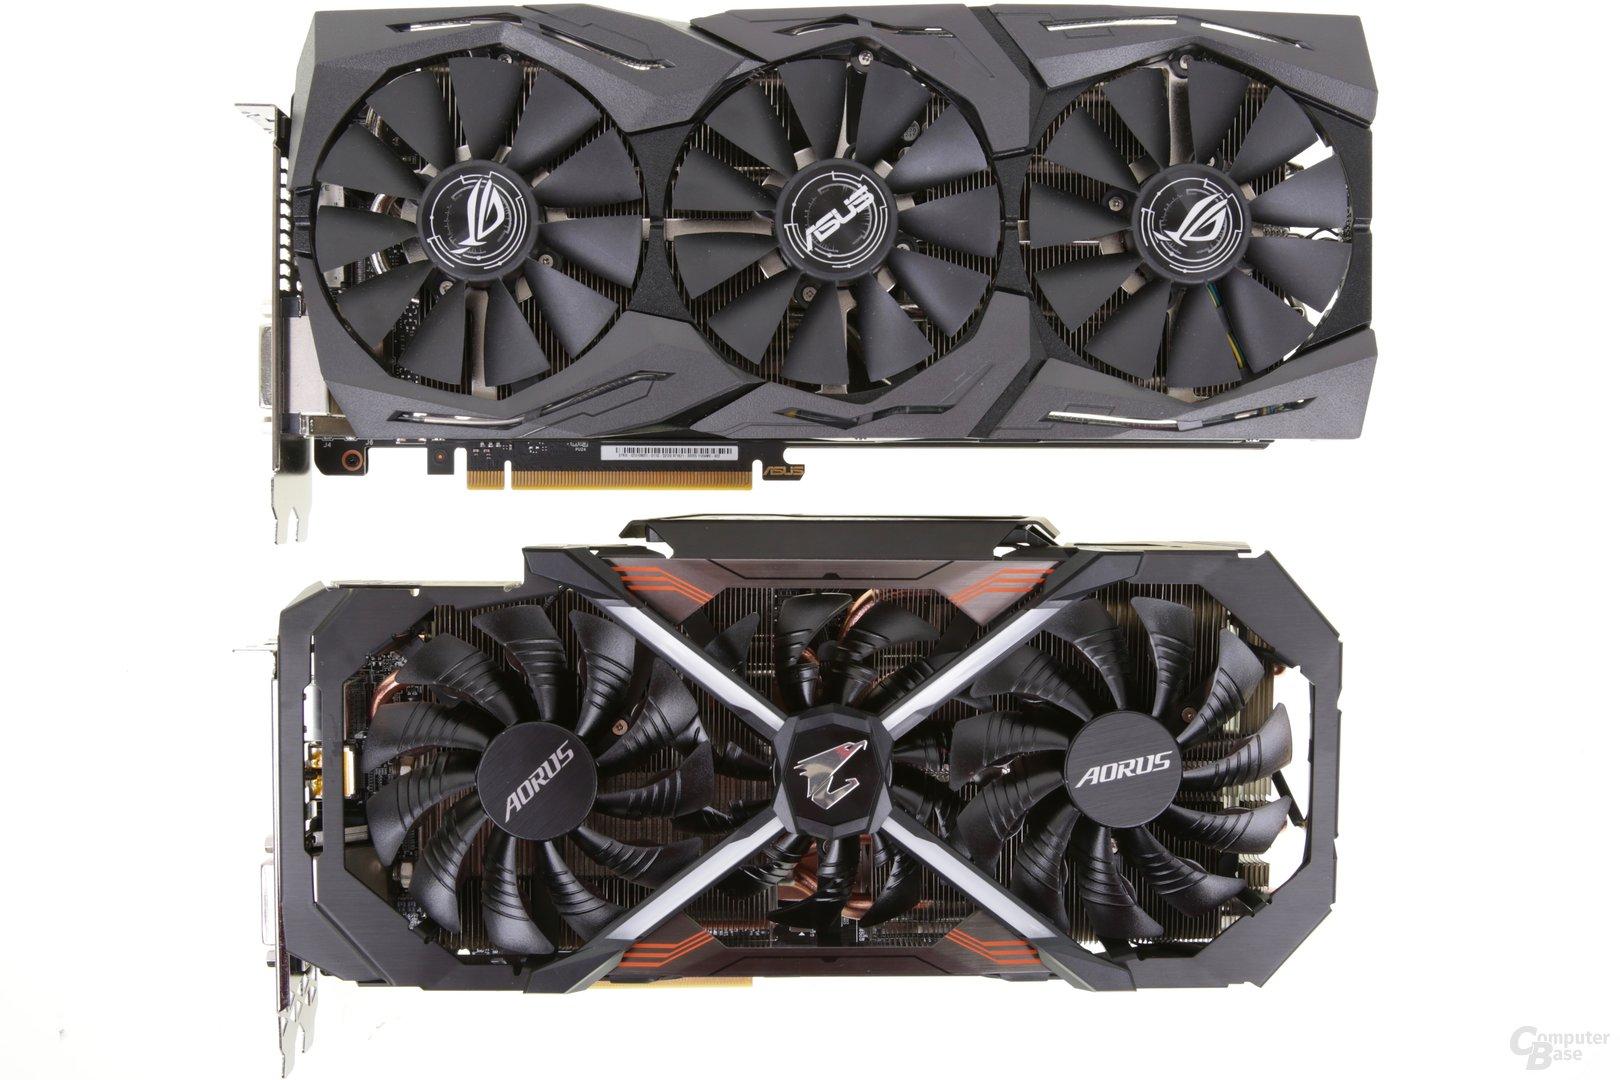 Asus GeForce GTX 1080 Ti Strix OC Edition vs. Gigabyte Aorus GeForce GTX 1080 TI